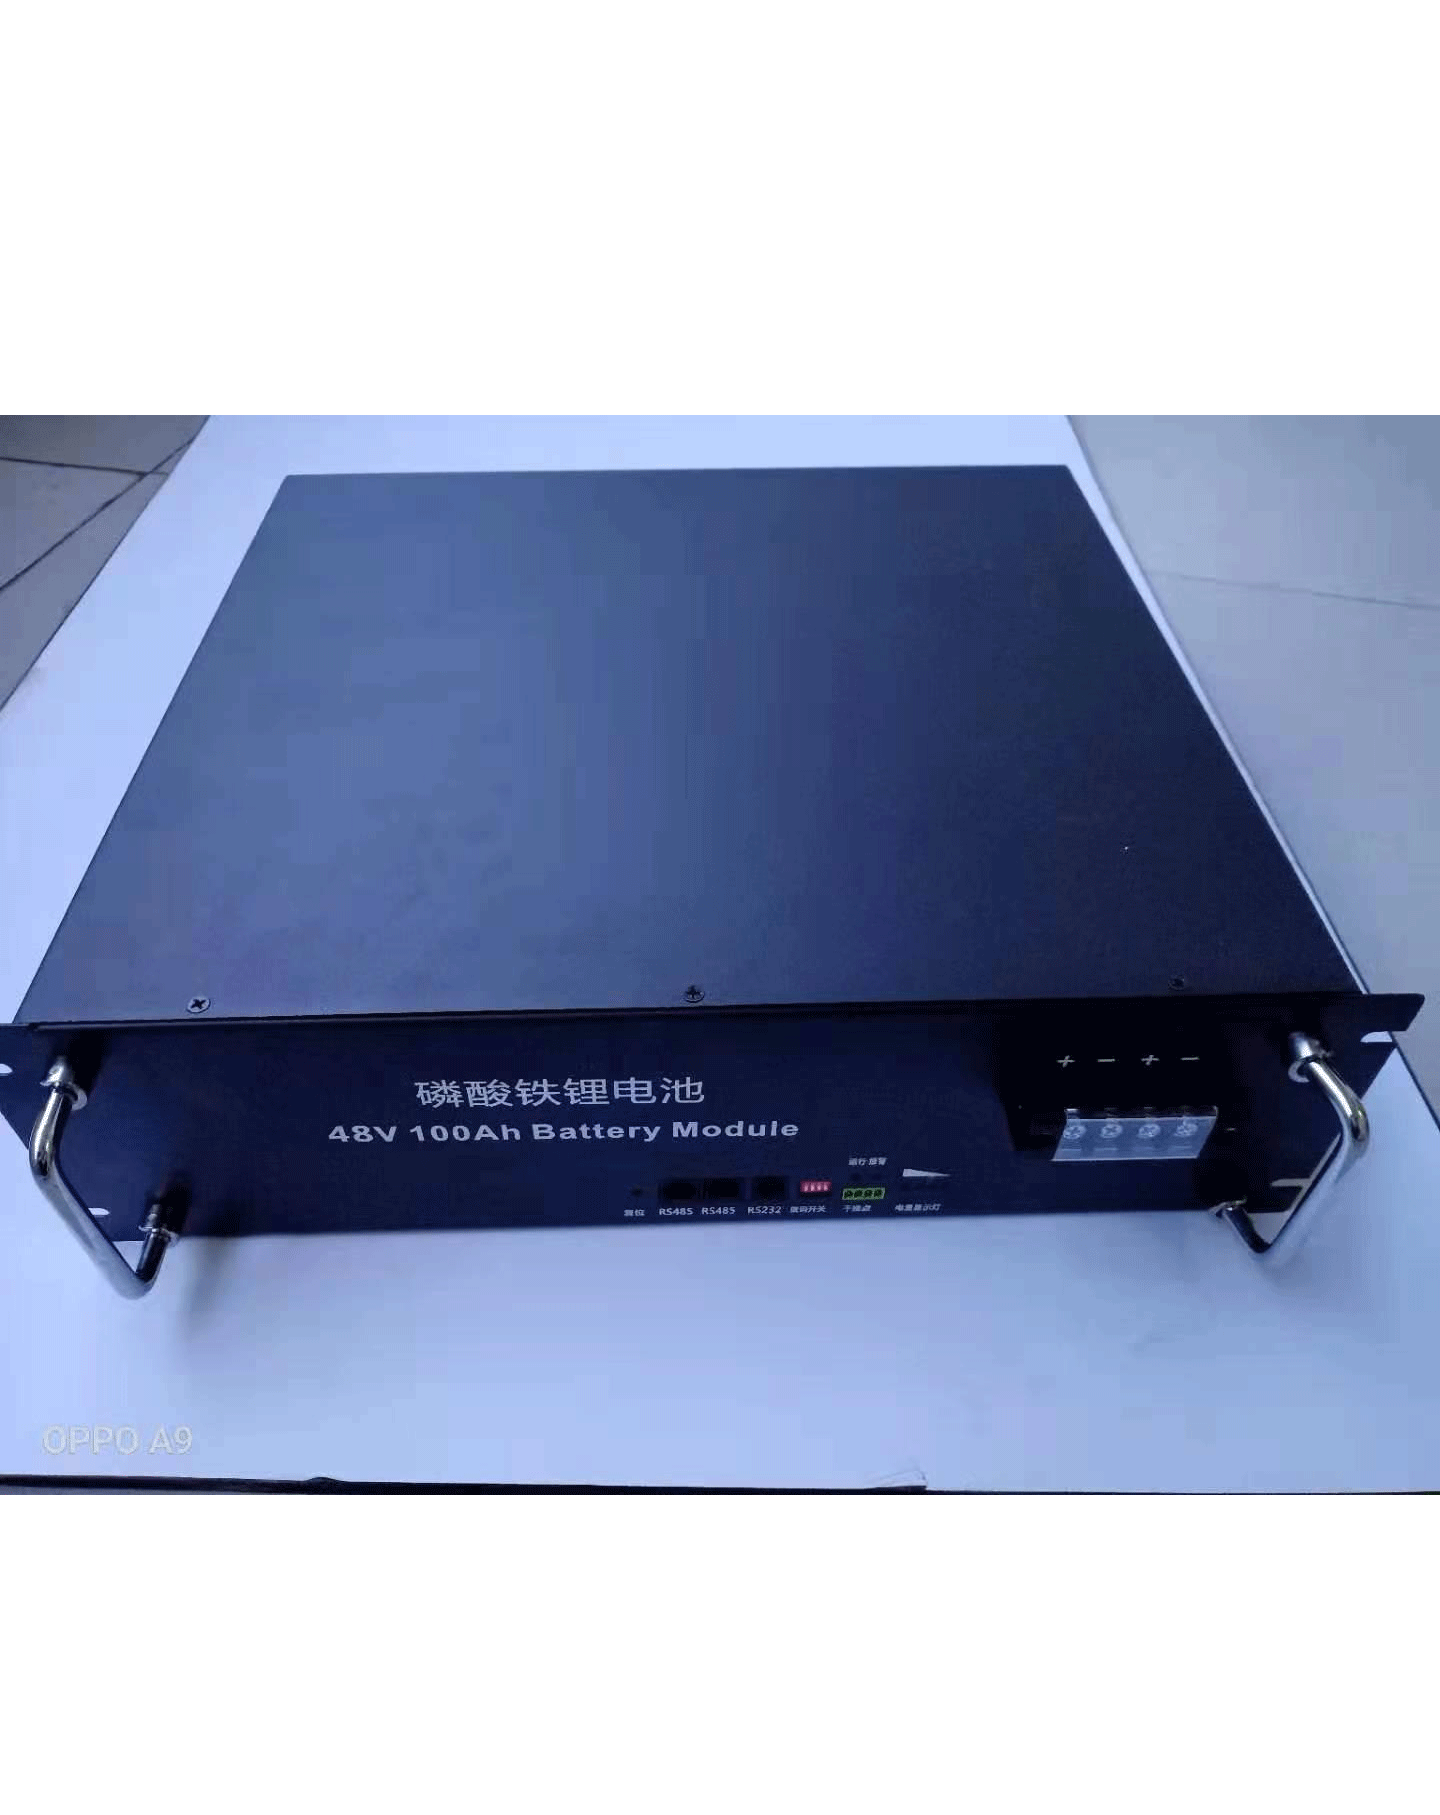 3U机房ups通信基站锂电池系统